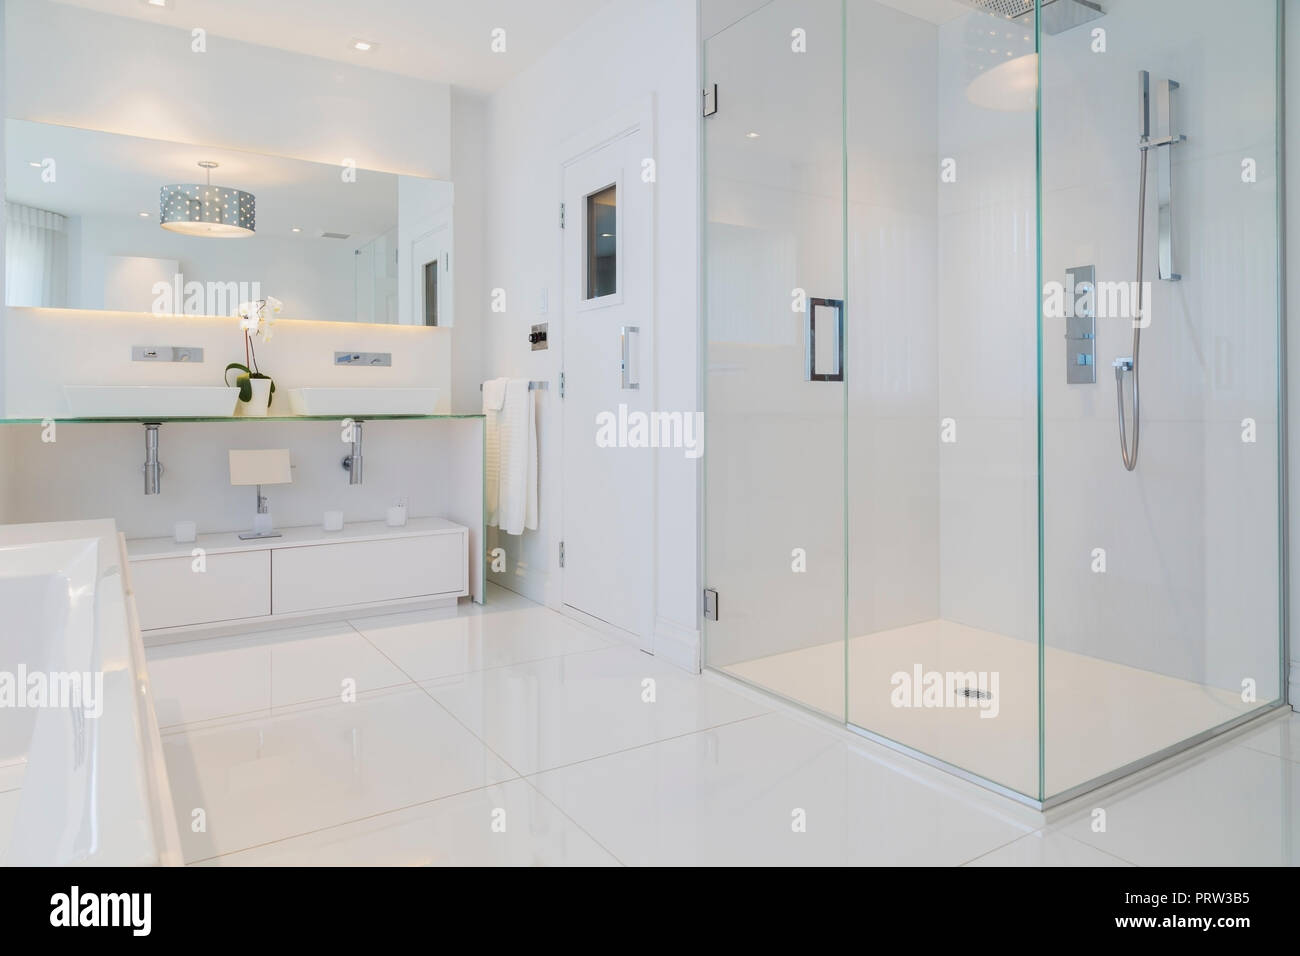 Baignoire blanche, miroir mural, cabine de douche en verre ...